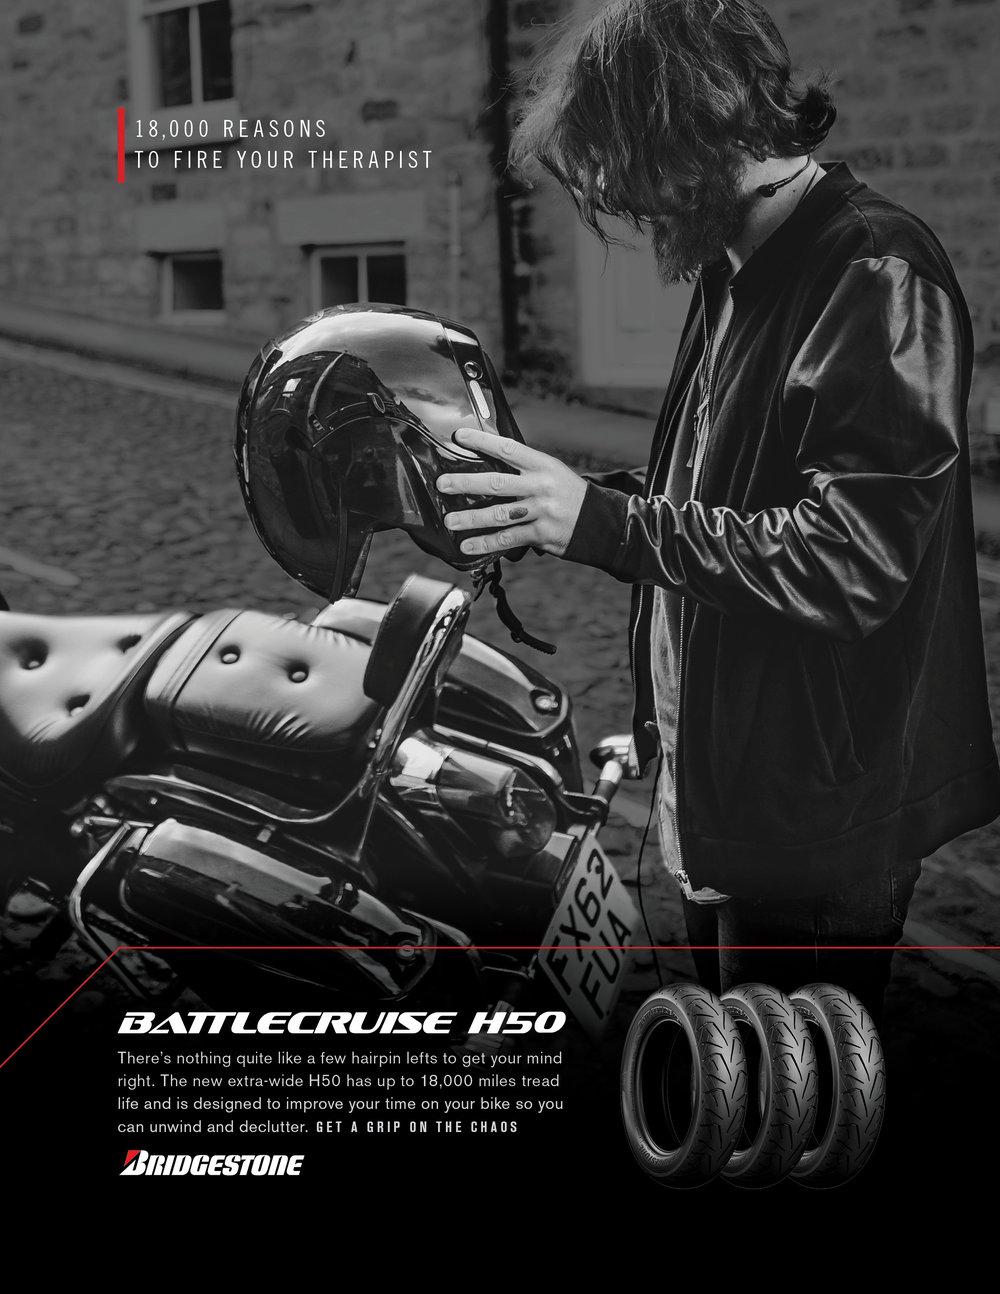 Battlecruise_DesignExplorations_v2_11.27.179.jpg